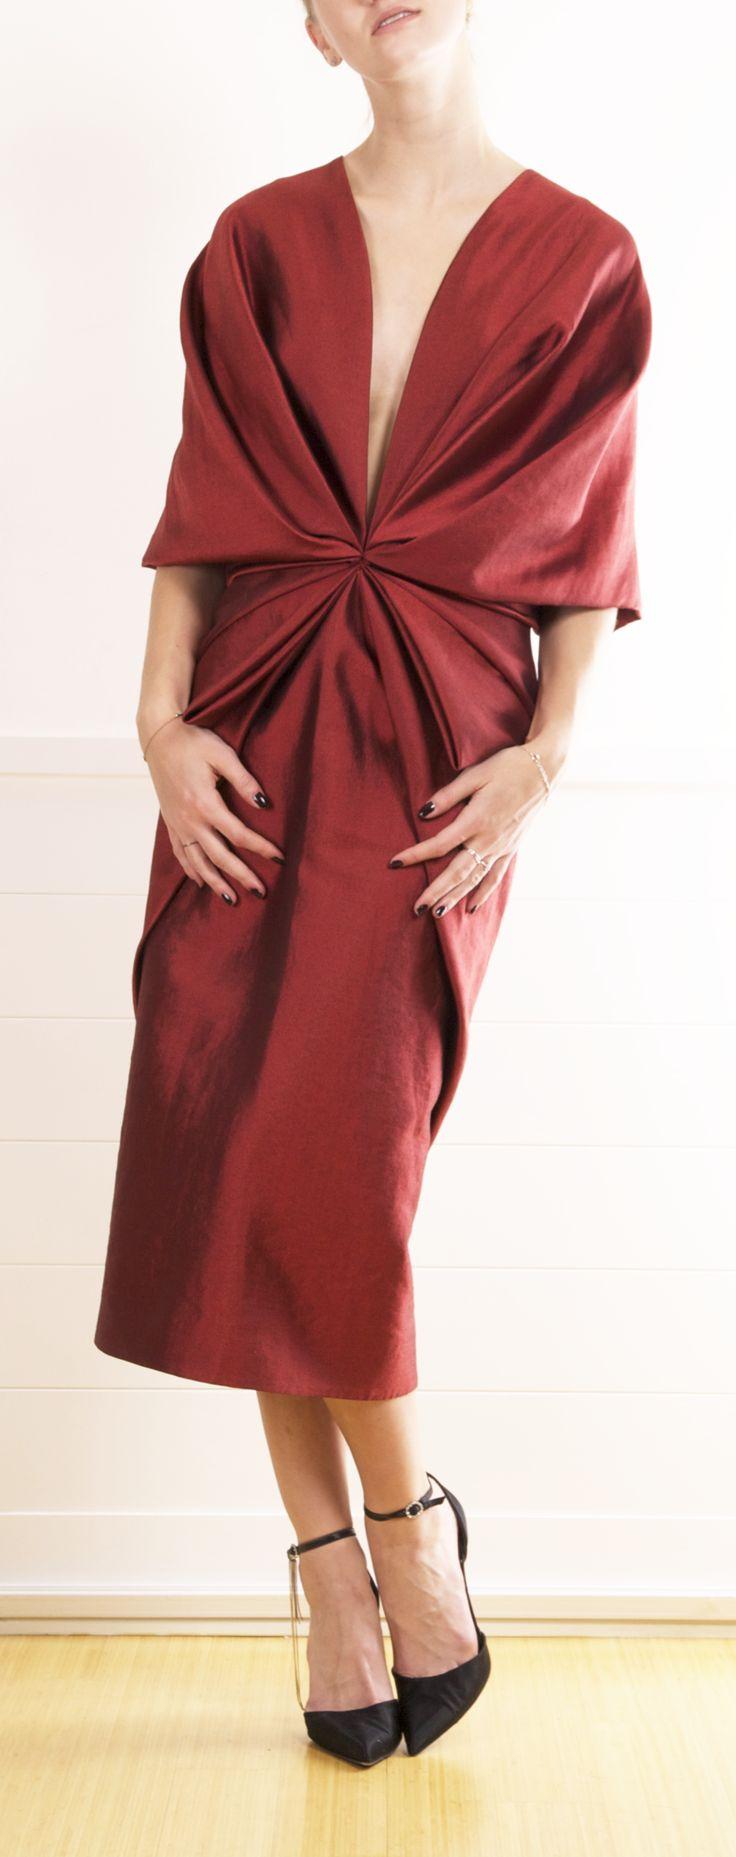 Imagini pentru heider akermann draped dress